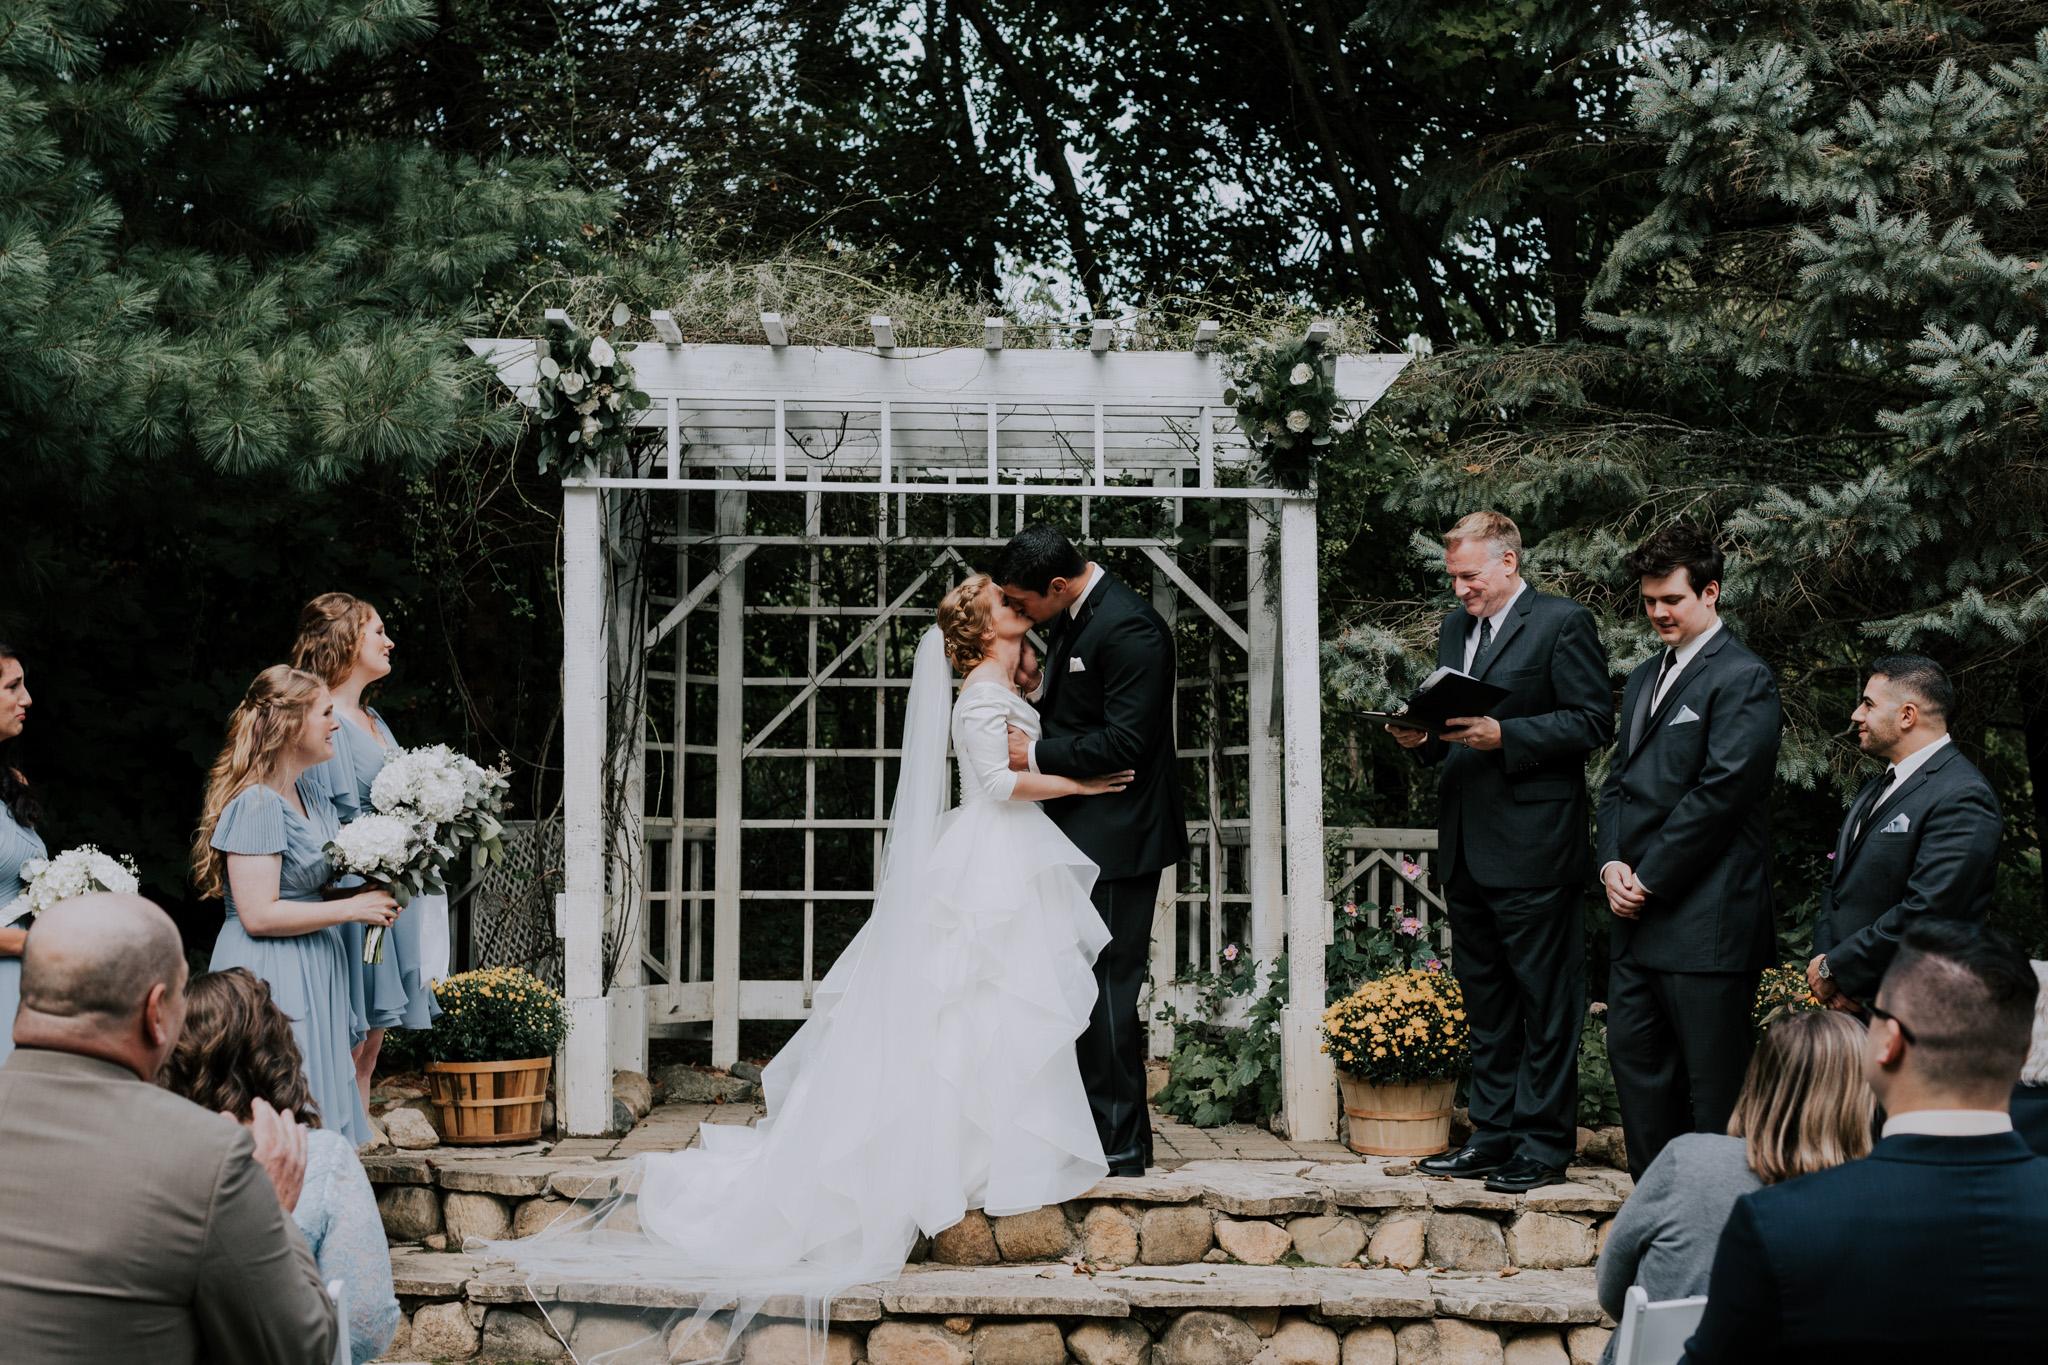 MillCreek-Wilde-Wedding-Barn-Michigan-Eliza-Eric-Vafa-Photo673.jpg